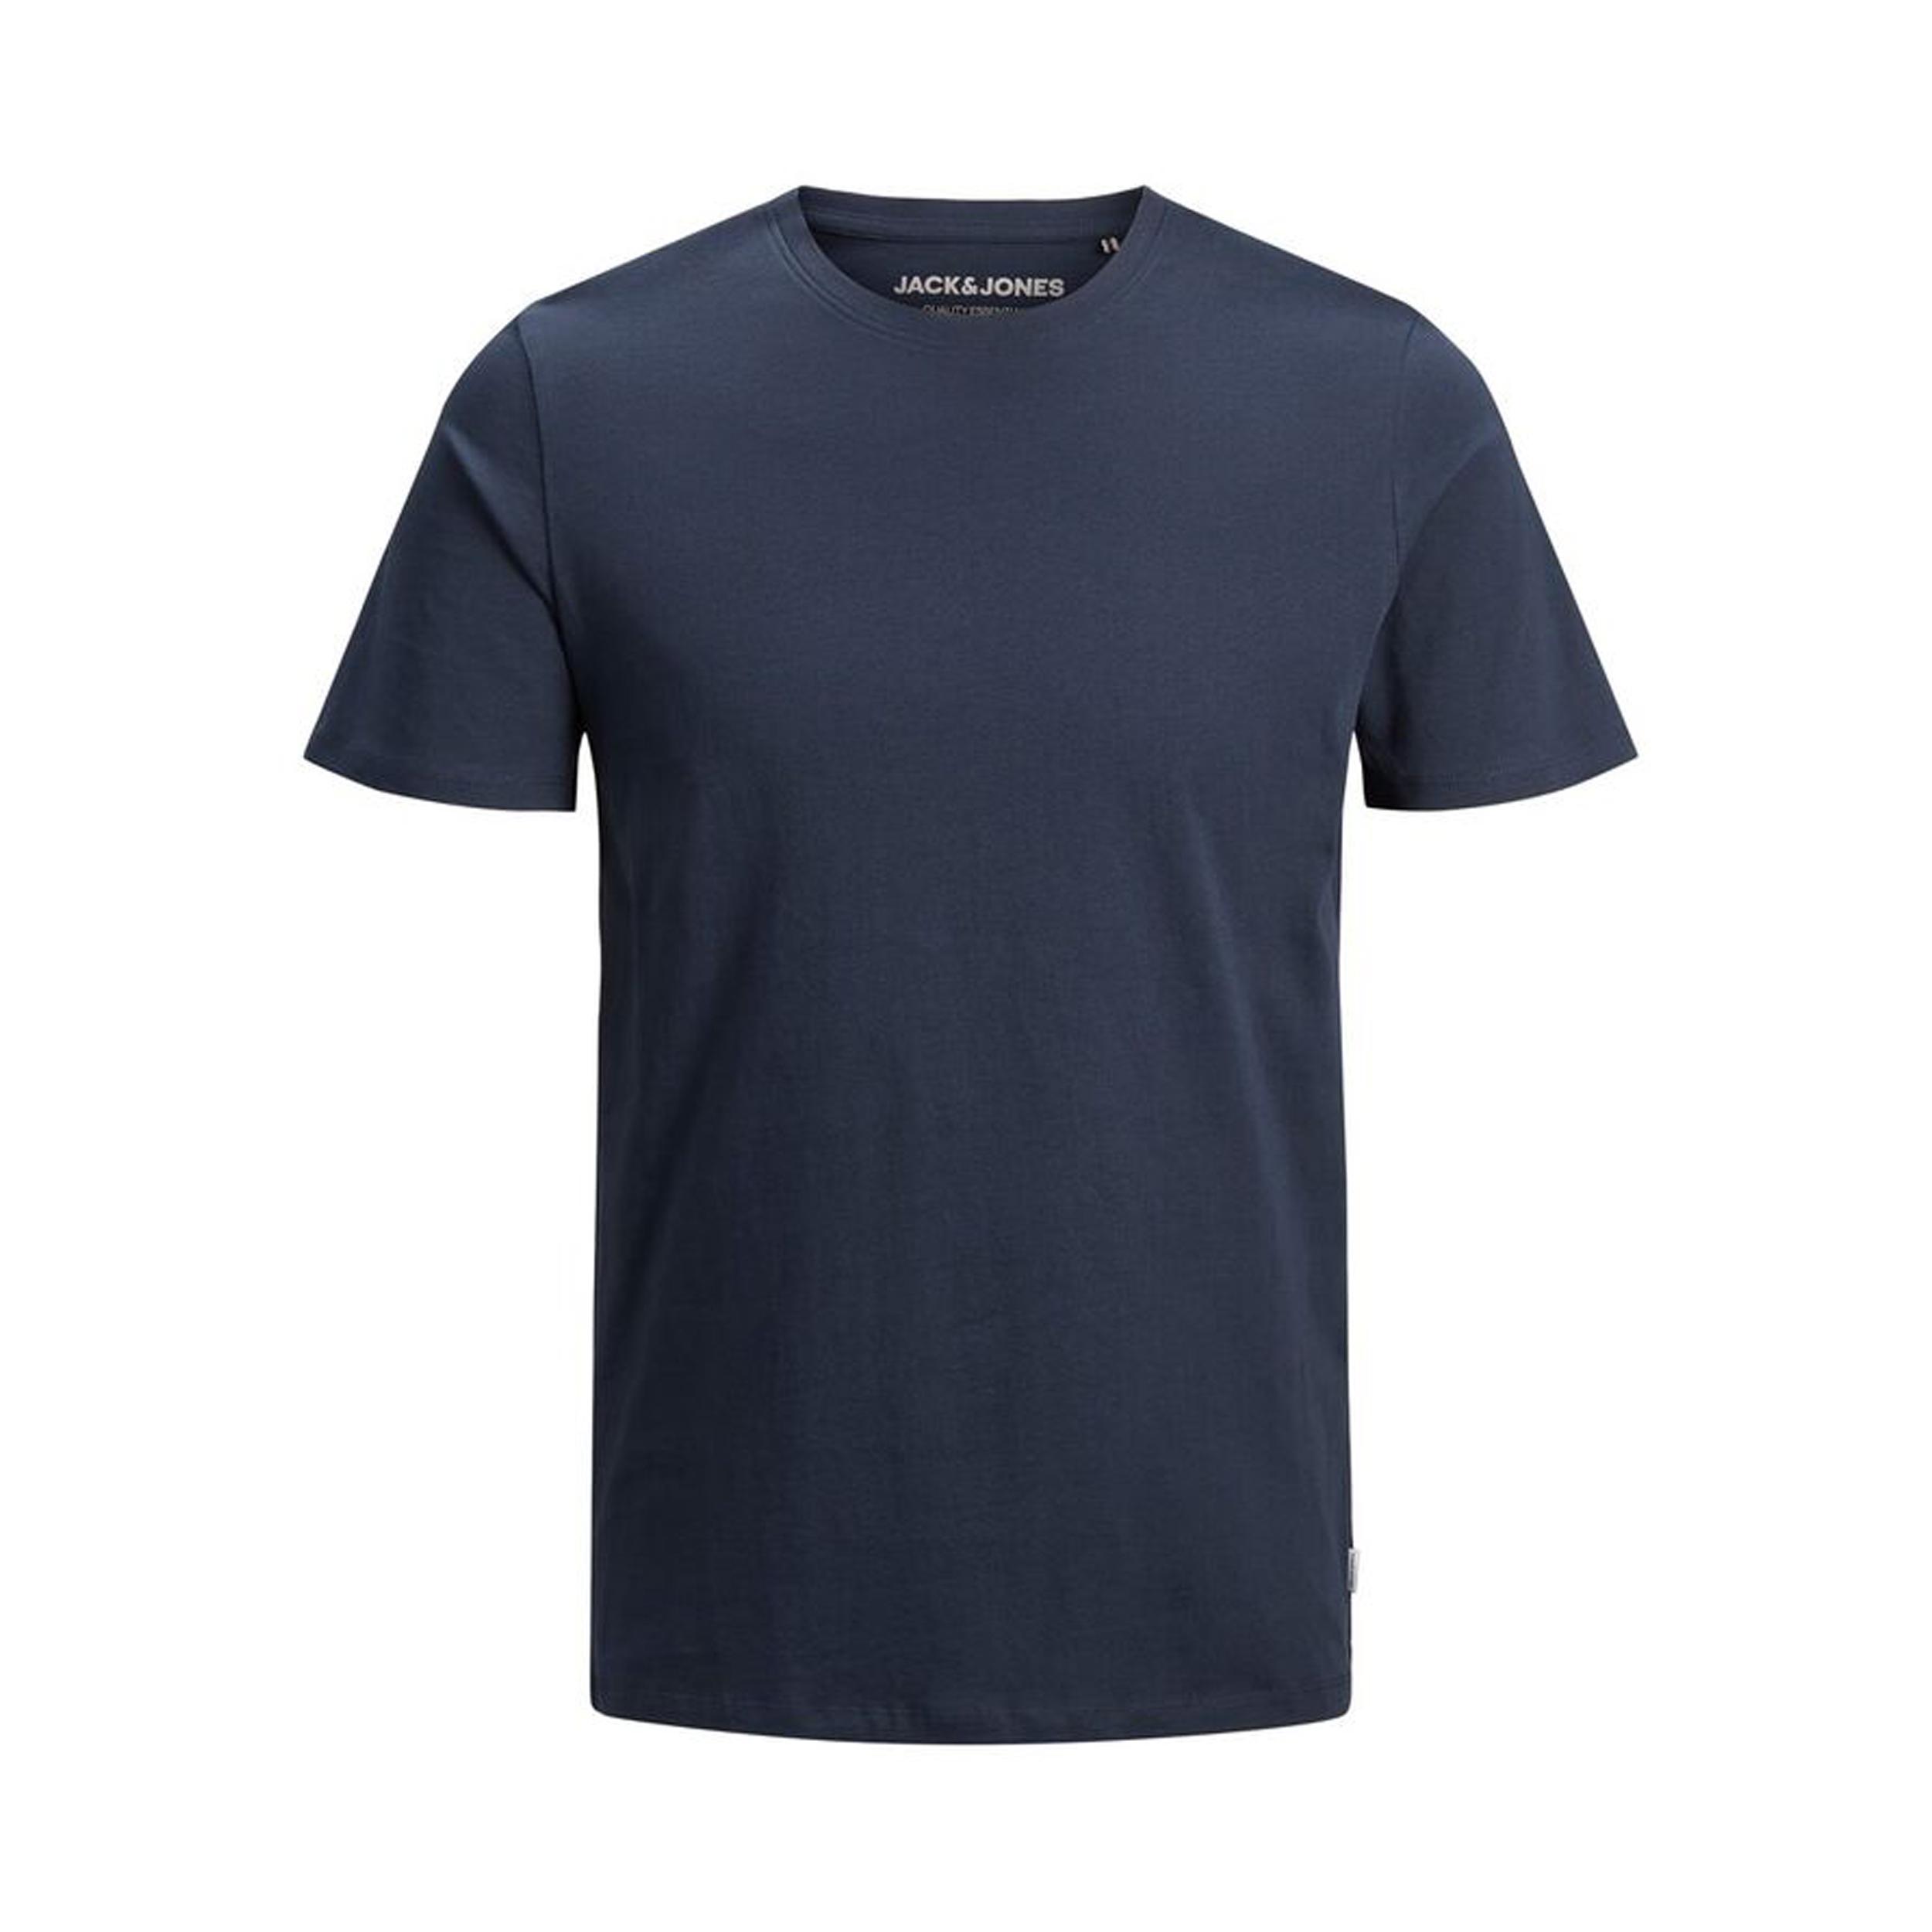 Tee-shirt col rond  organic en coton biologique bleu marine